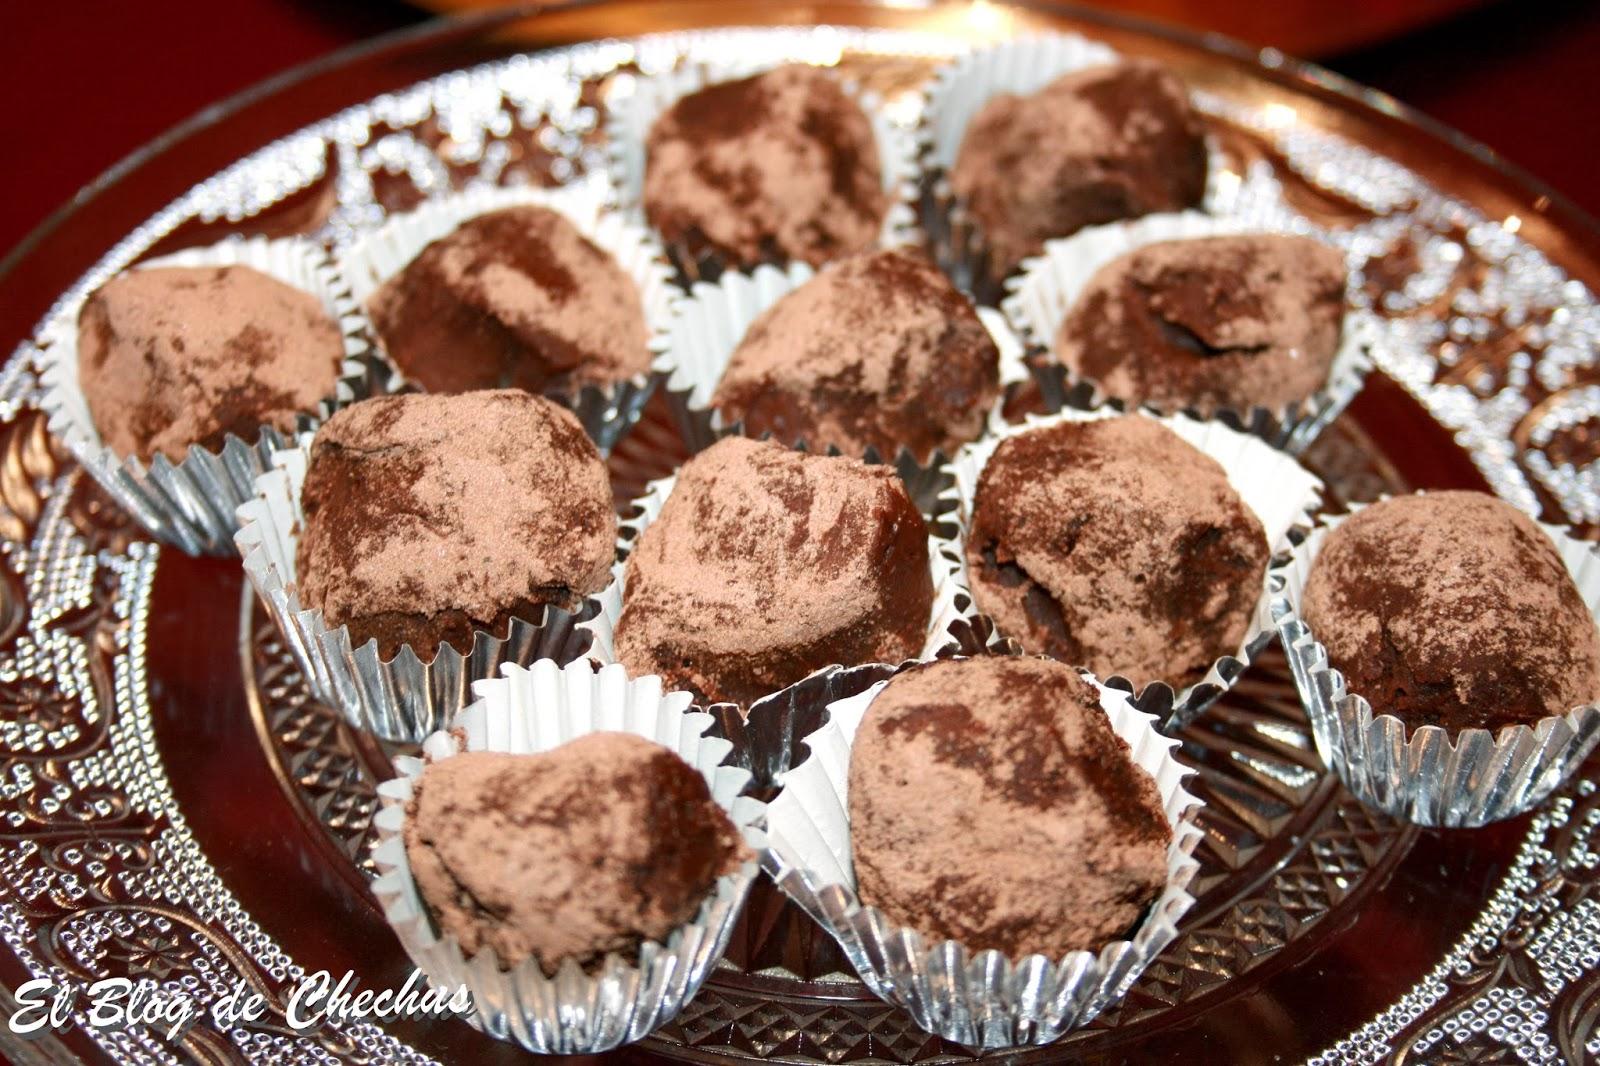 Trufas con naranja confitada, El Blog de Chechus, Chechus Cupcakes, postres